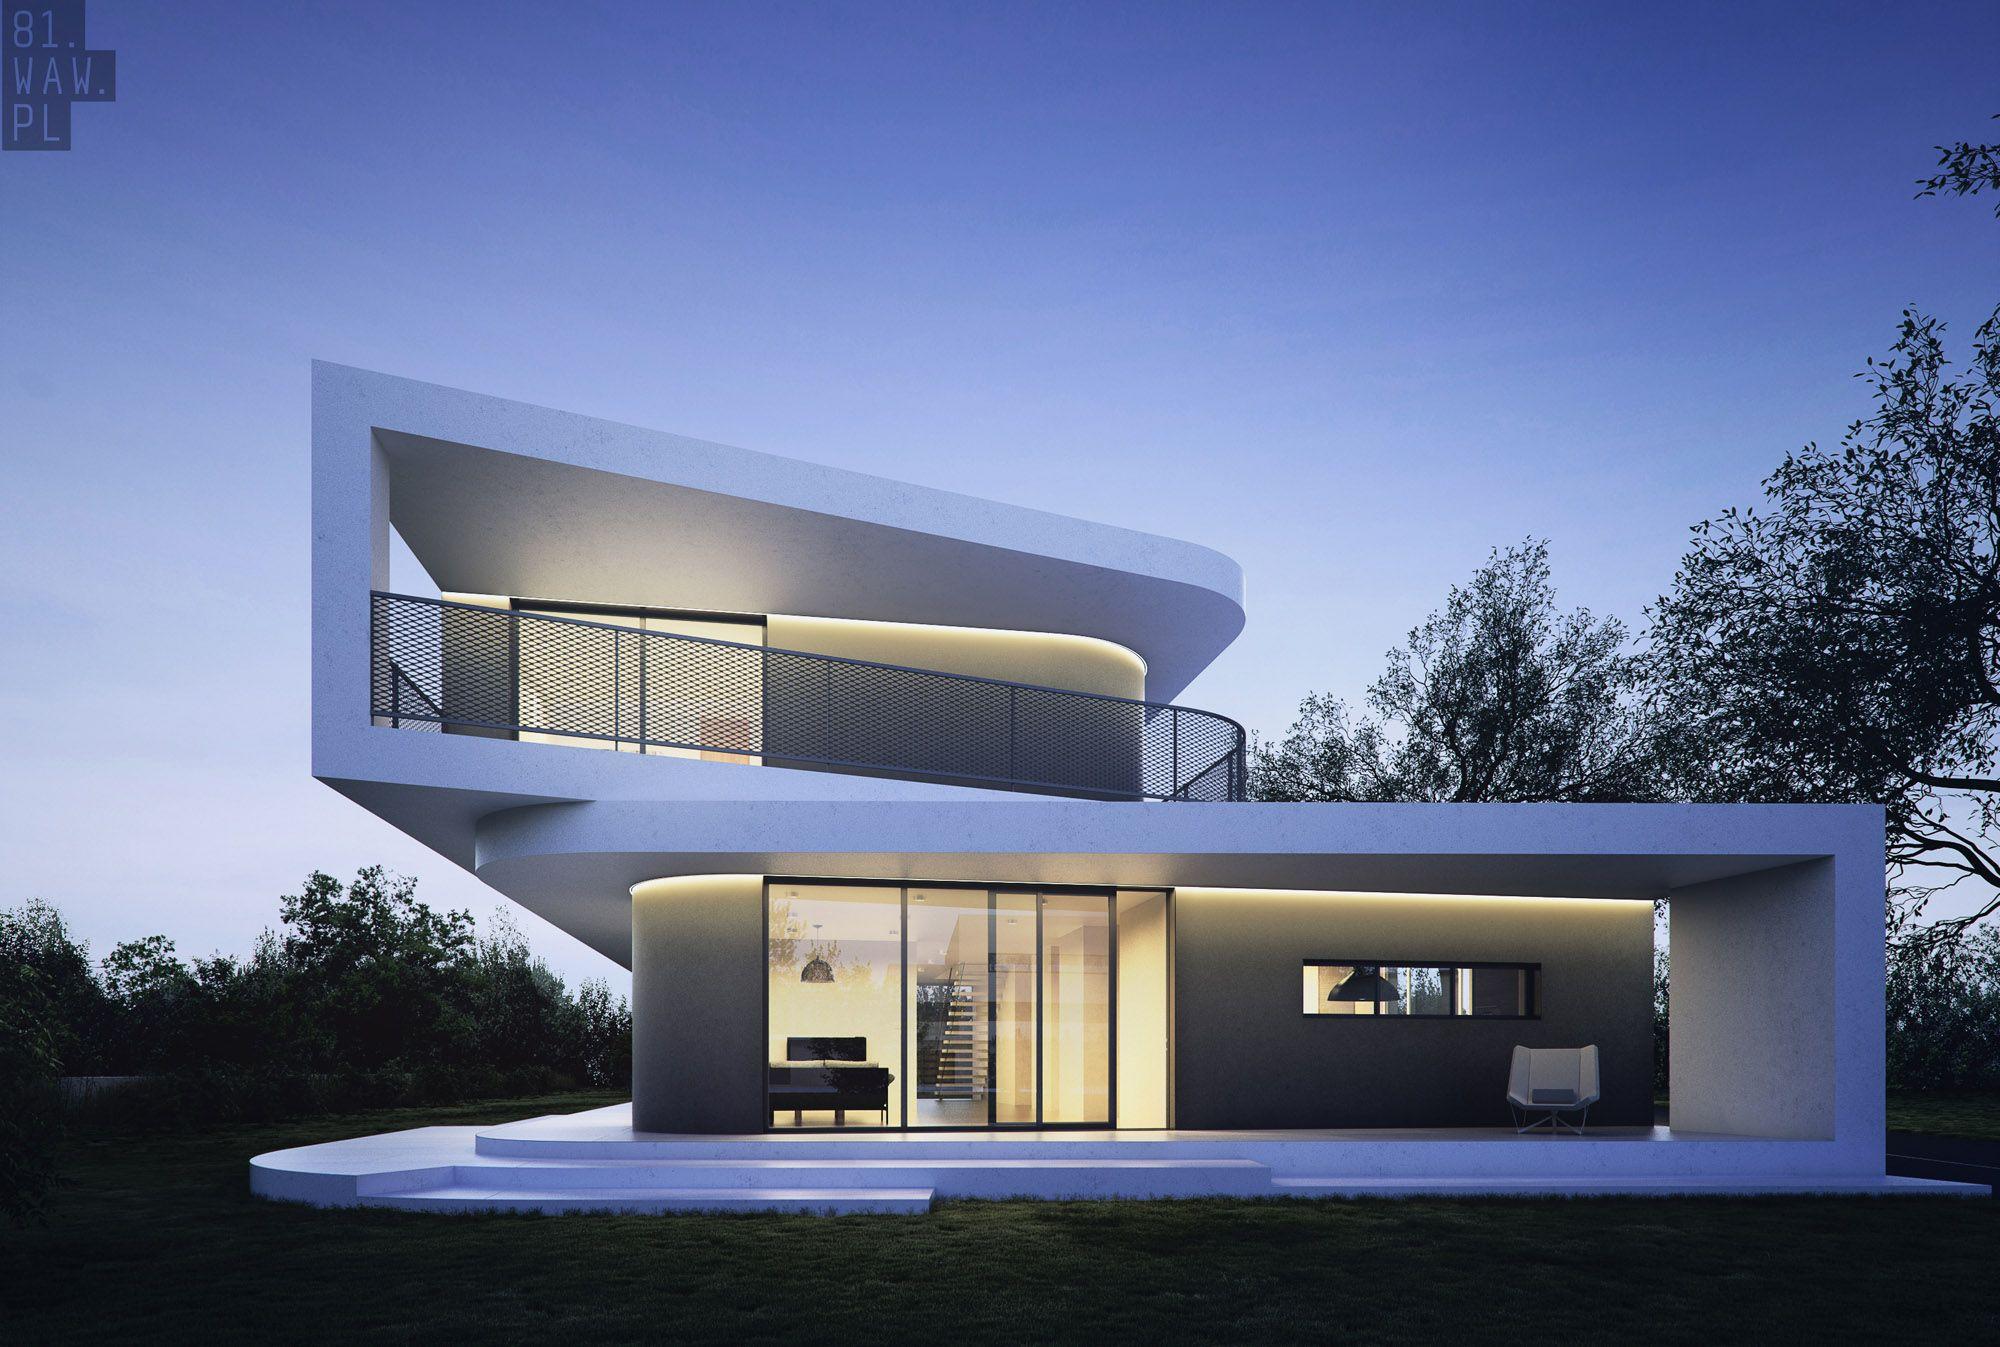 Dom trapez projektu pln design polish for Casa moderna arquitectura